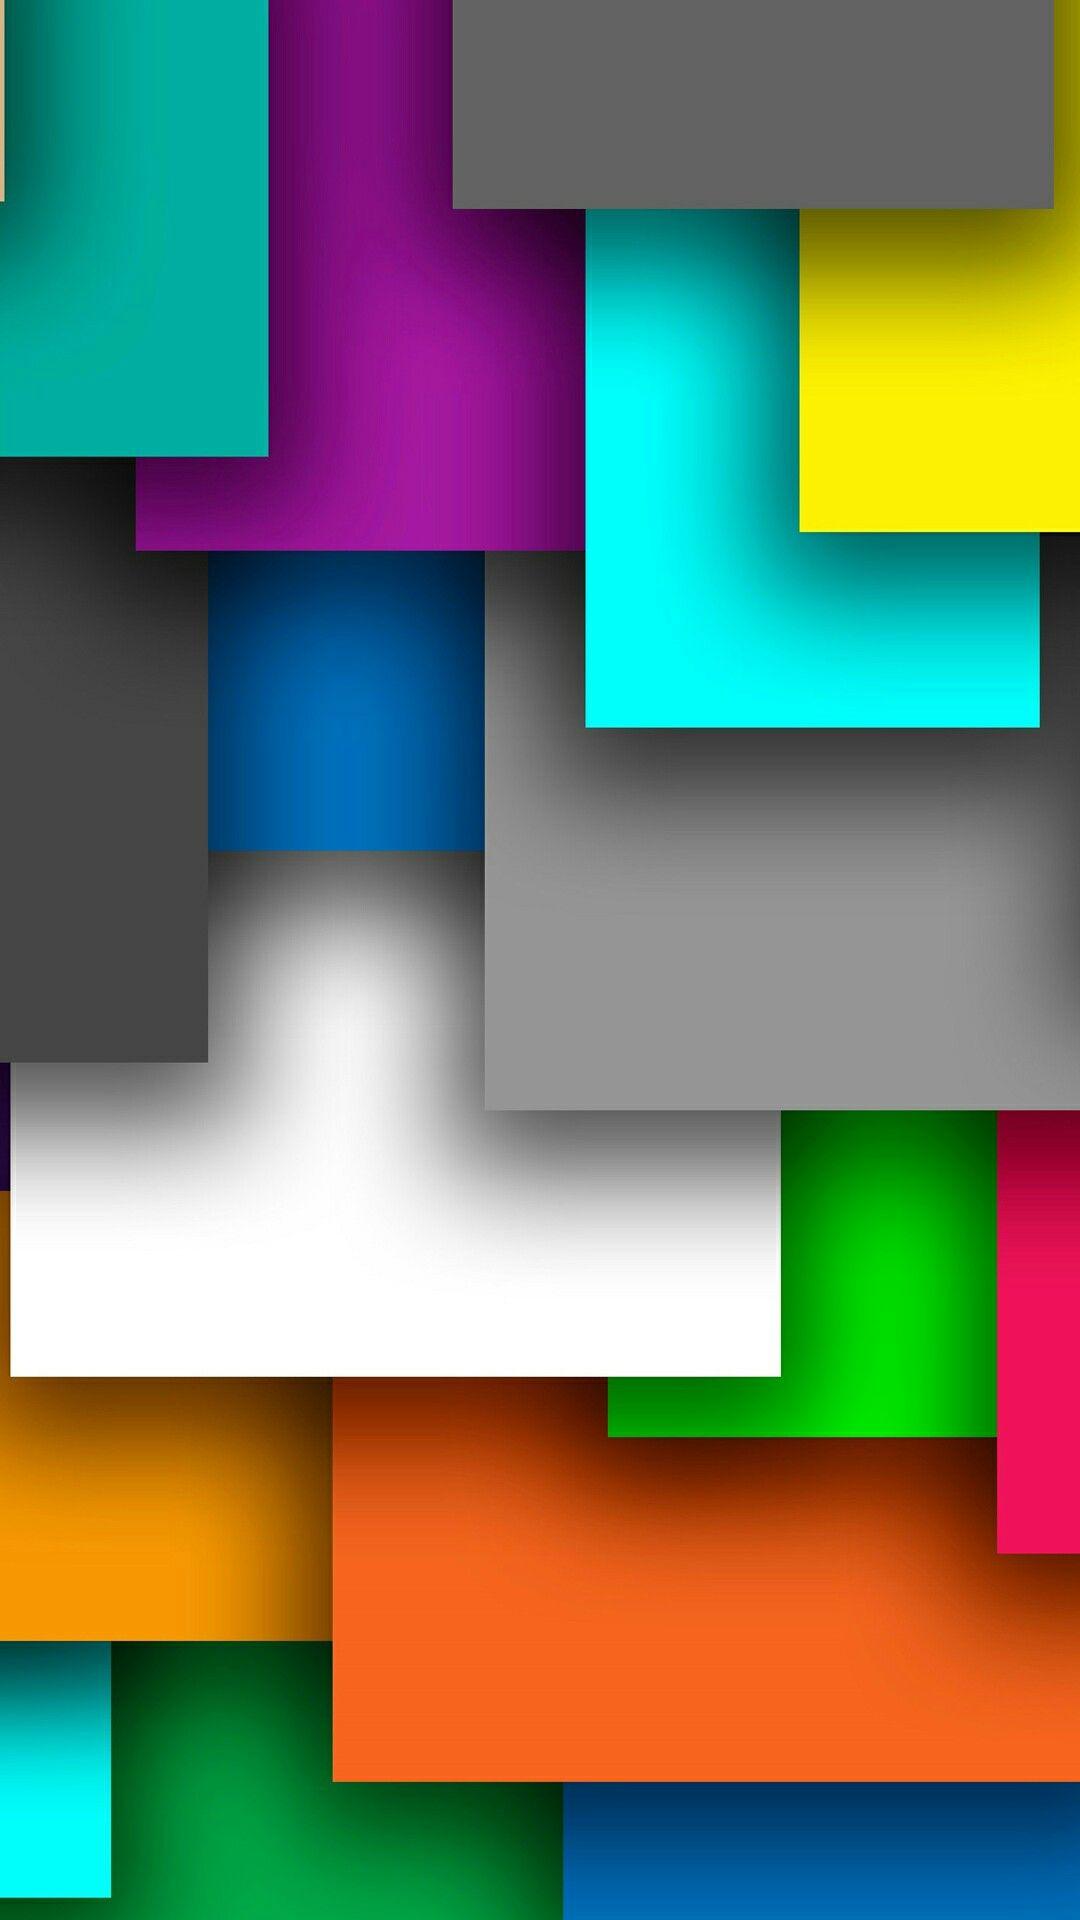 Free Colorful Geometric Wallpaper: Cute Geometric Wallpaper